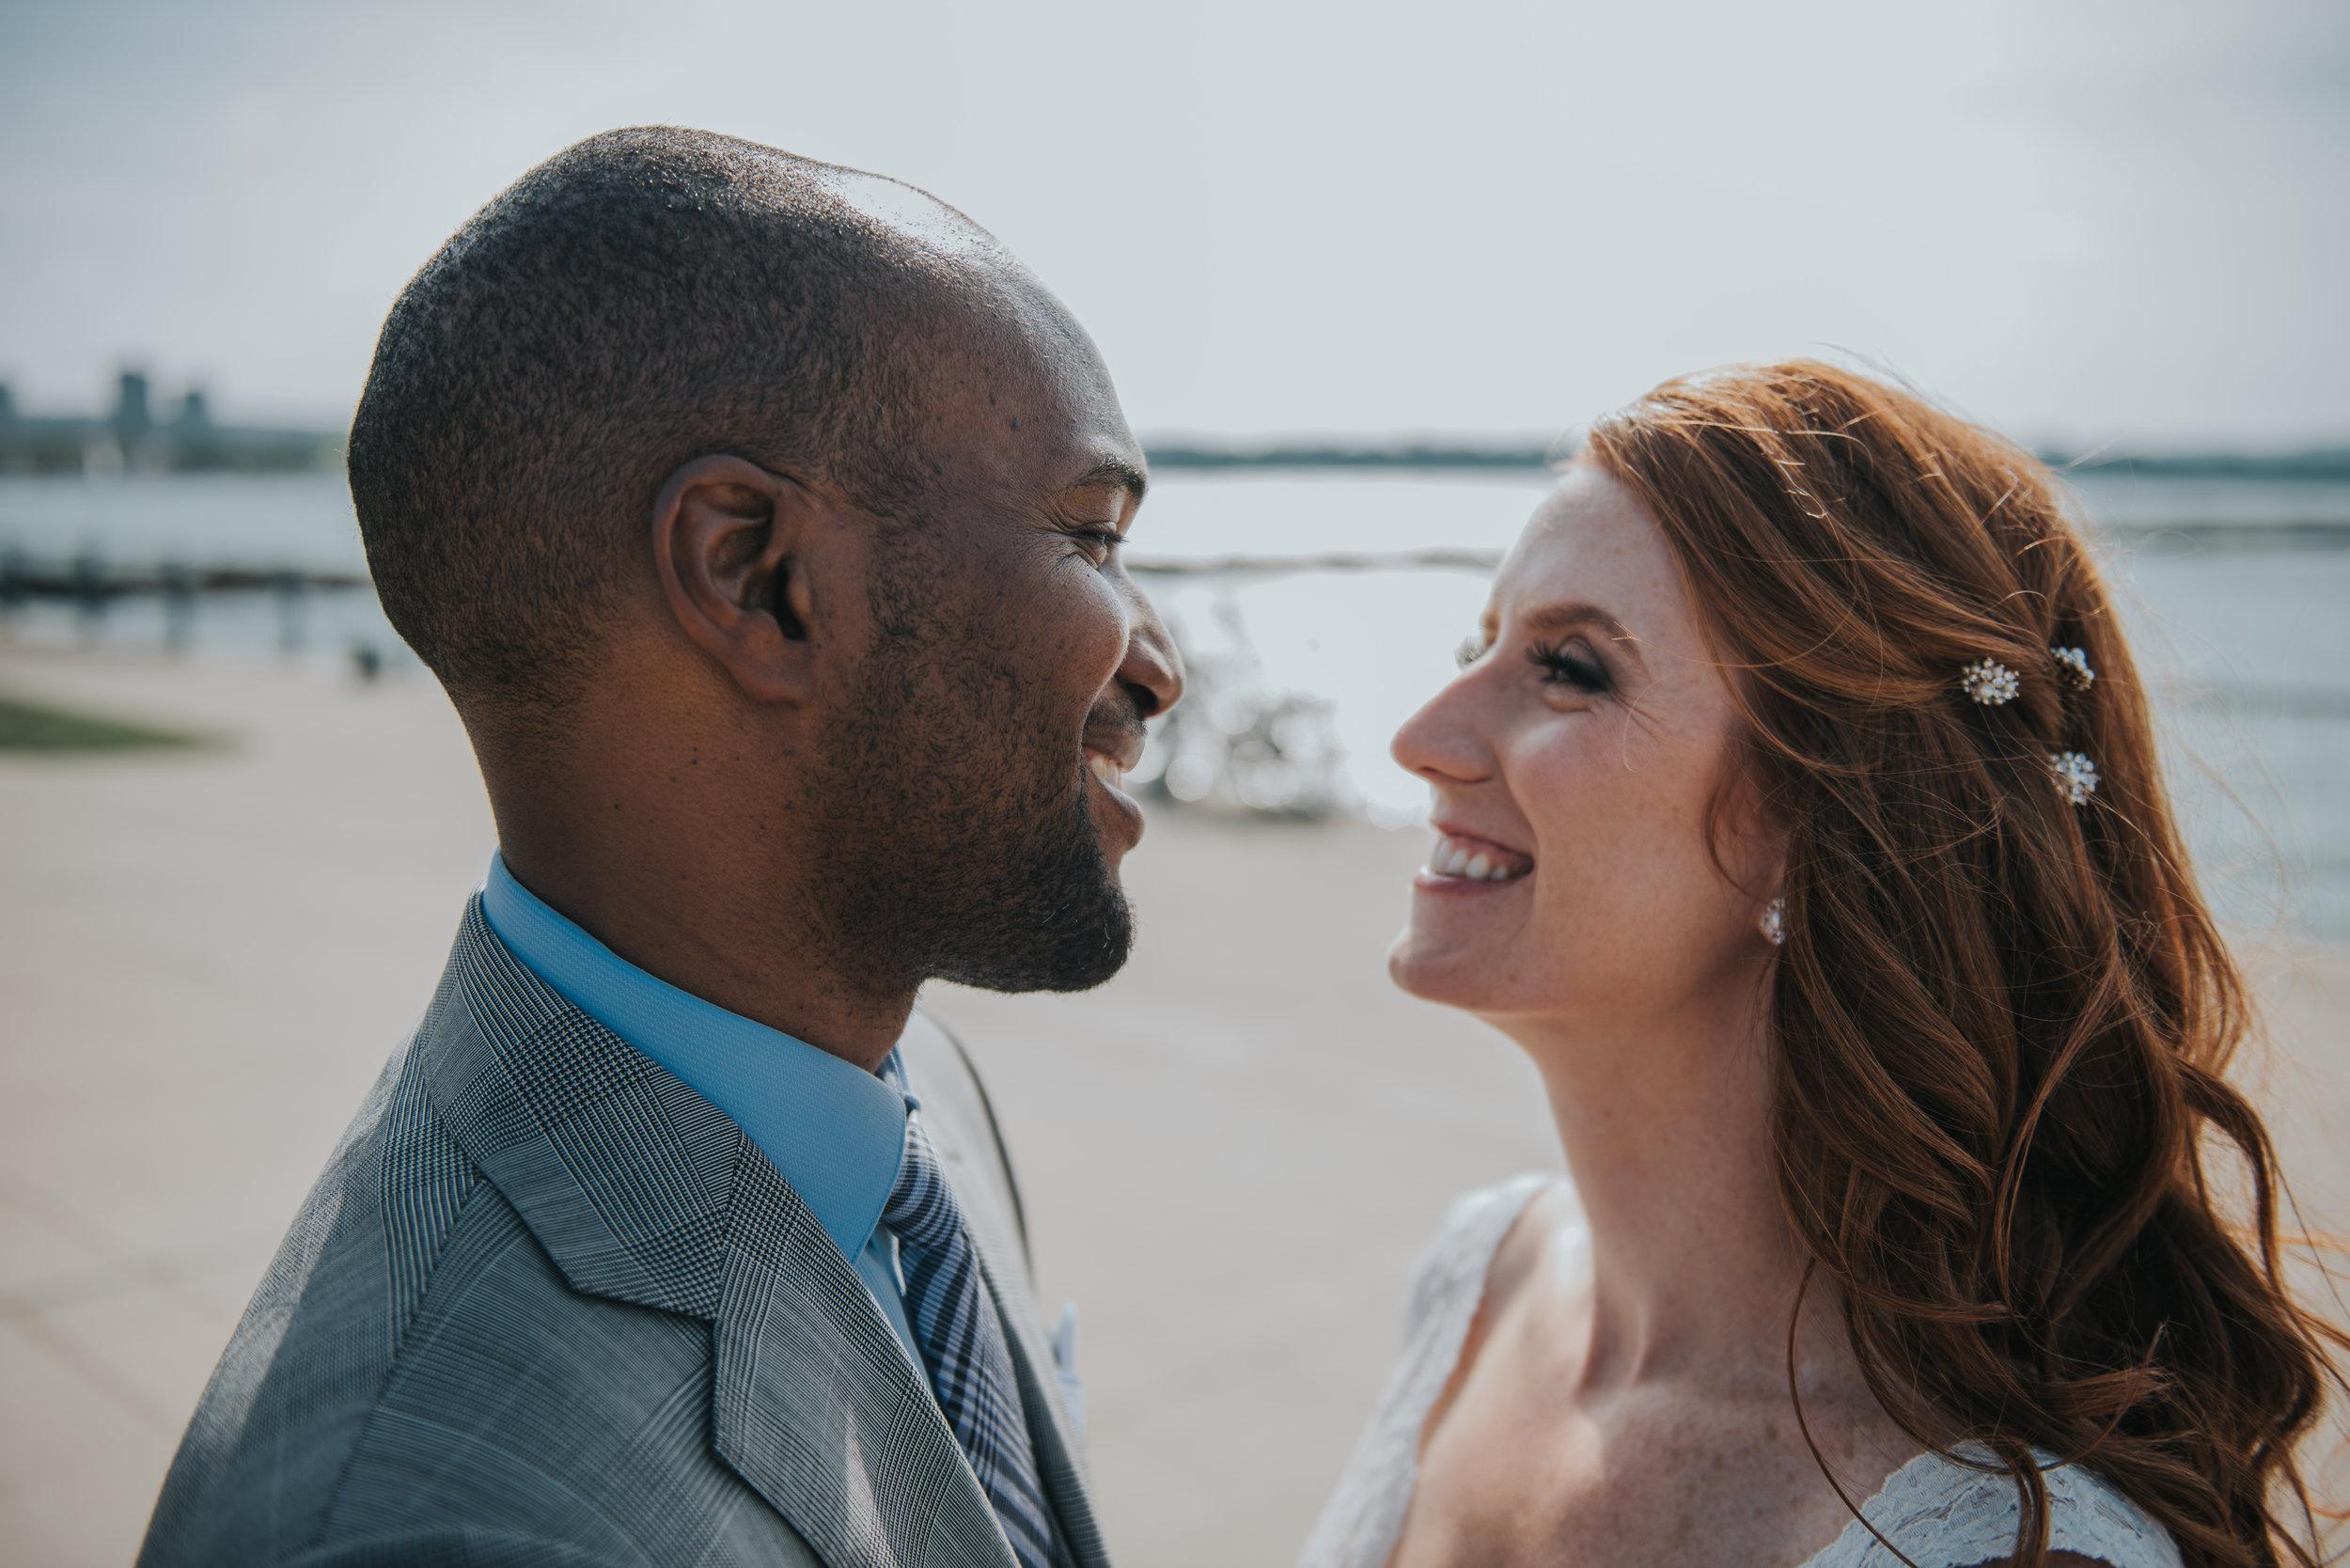 bride-groom-toronto-outdoor-summer-wedding-documentary-wedding-photography-by-willow-birch-photo.jpg